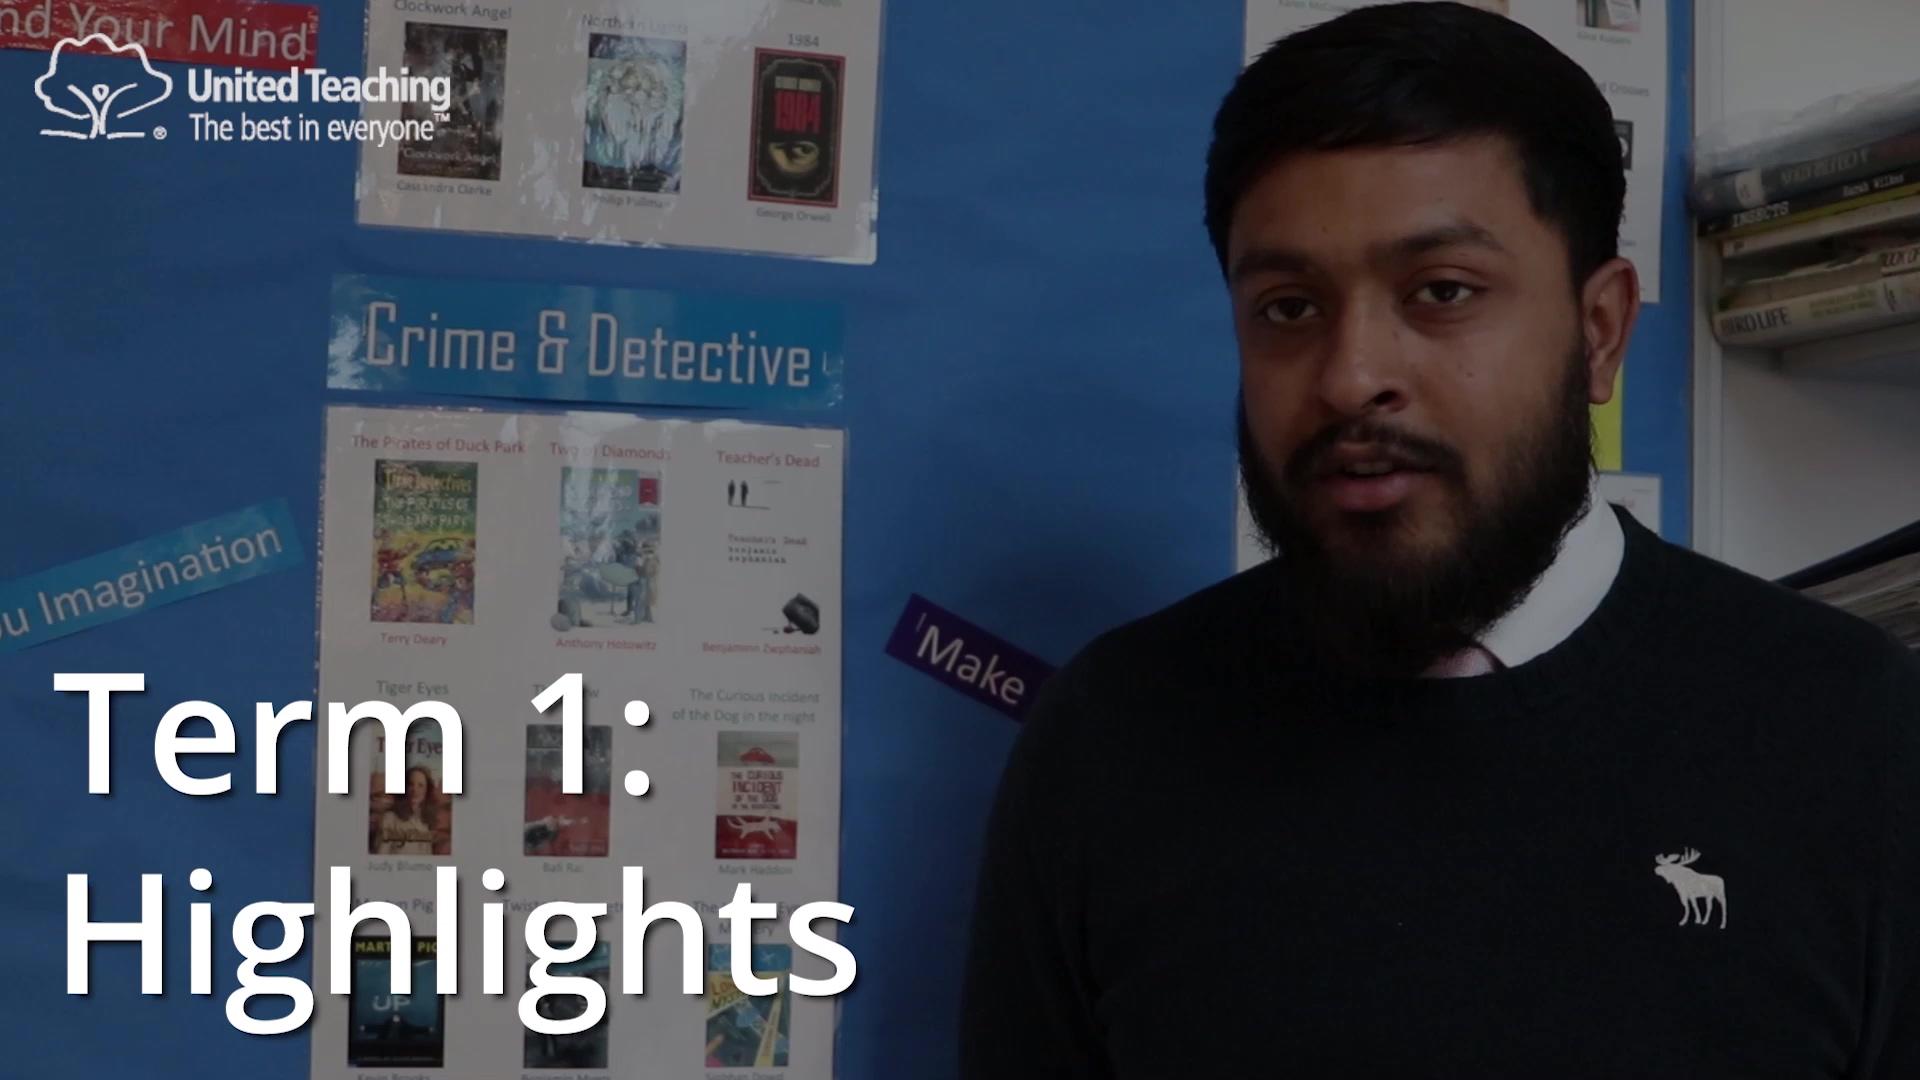 Imran - term 1 highlights